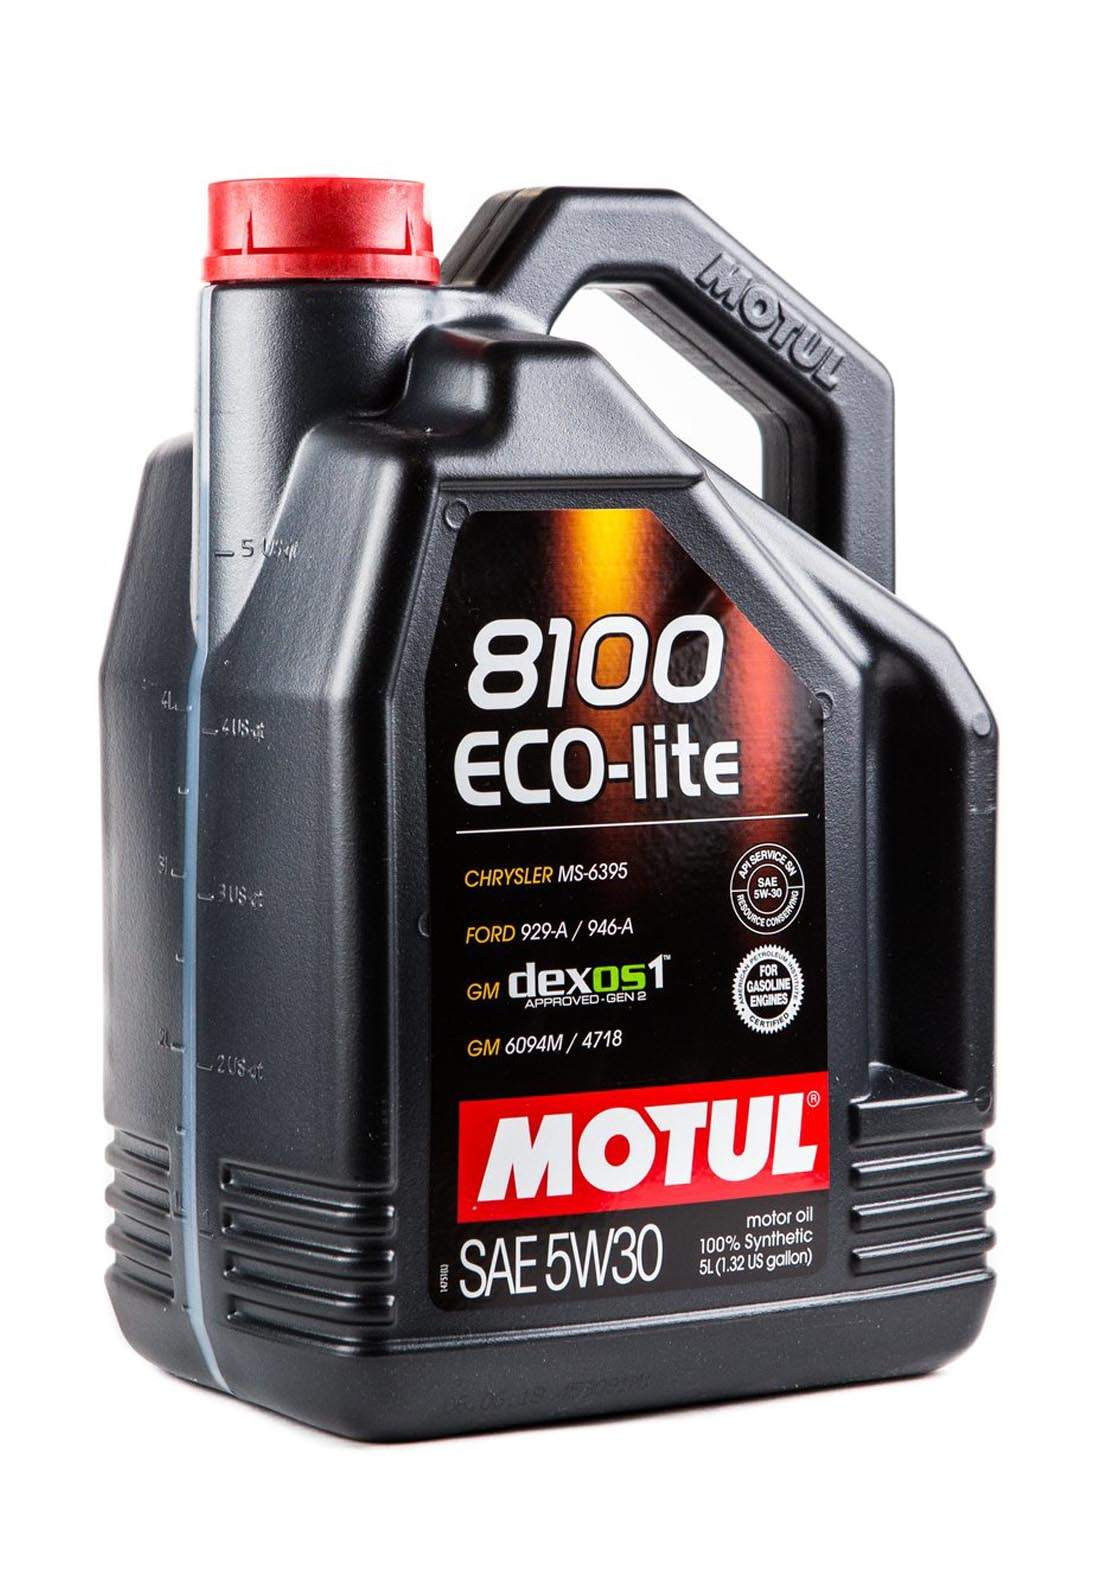 Motul 5w30 Eco-lite 8100  100% Synthetic oil 5L  زيت تخليقي 100% للسيارات